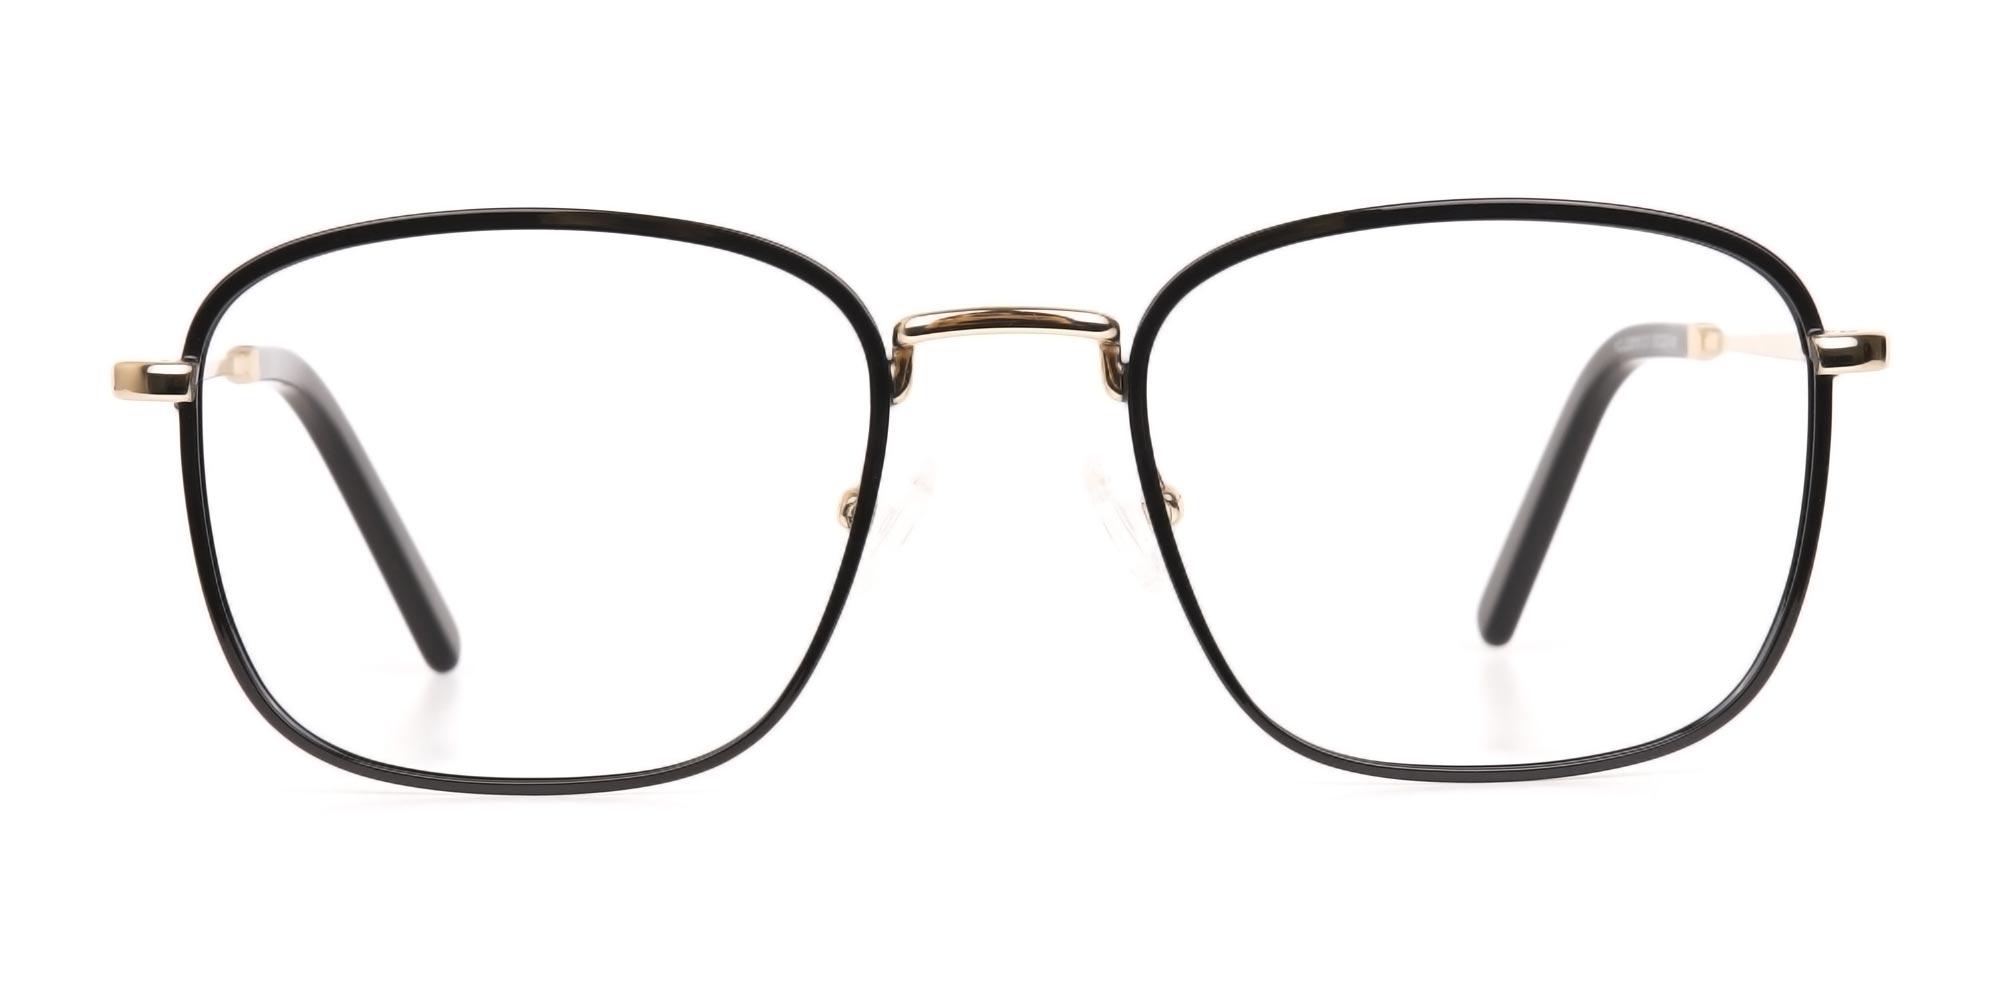 Black and Gold Glasses in Wayfarer Metal